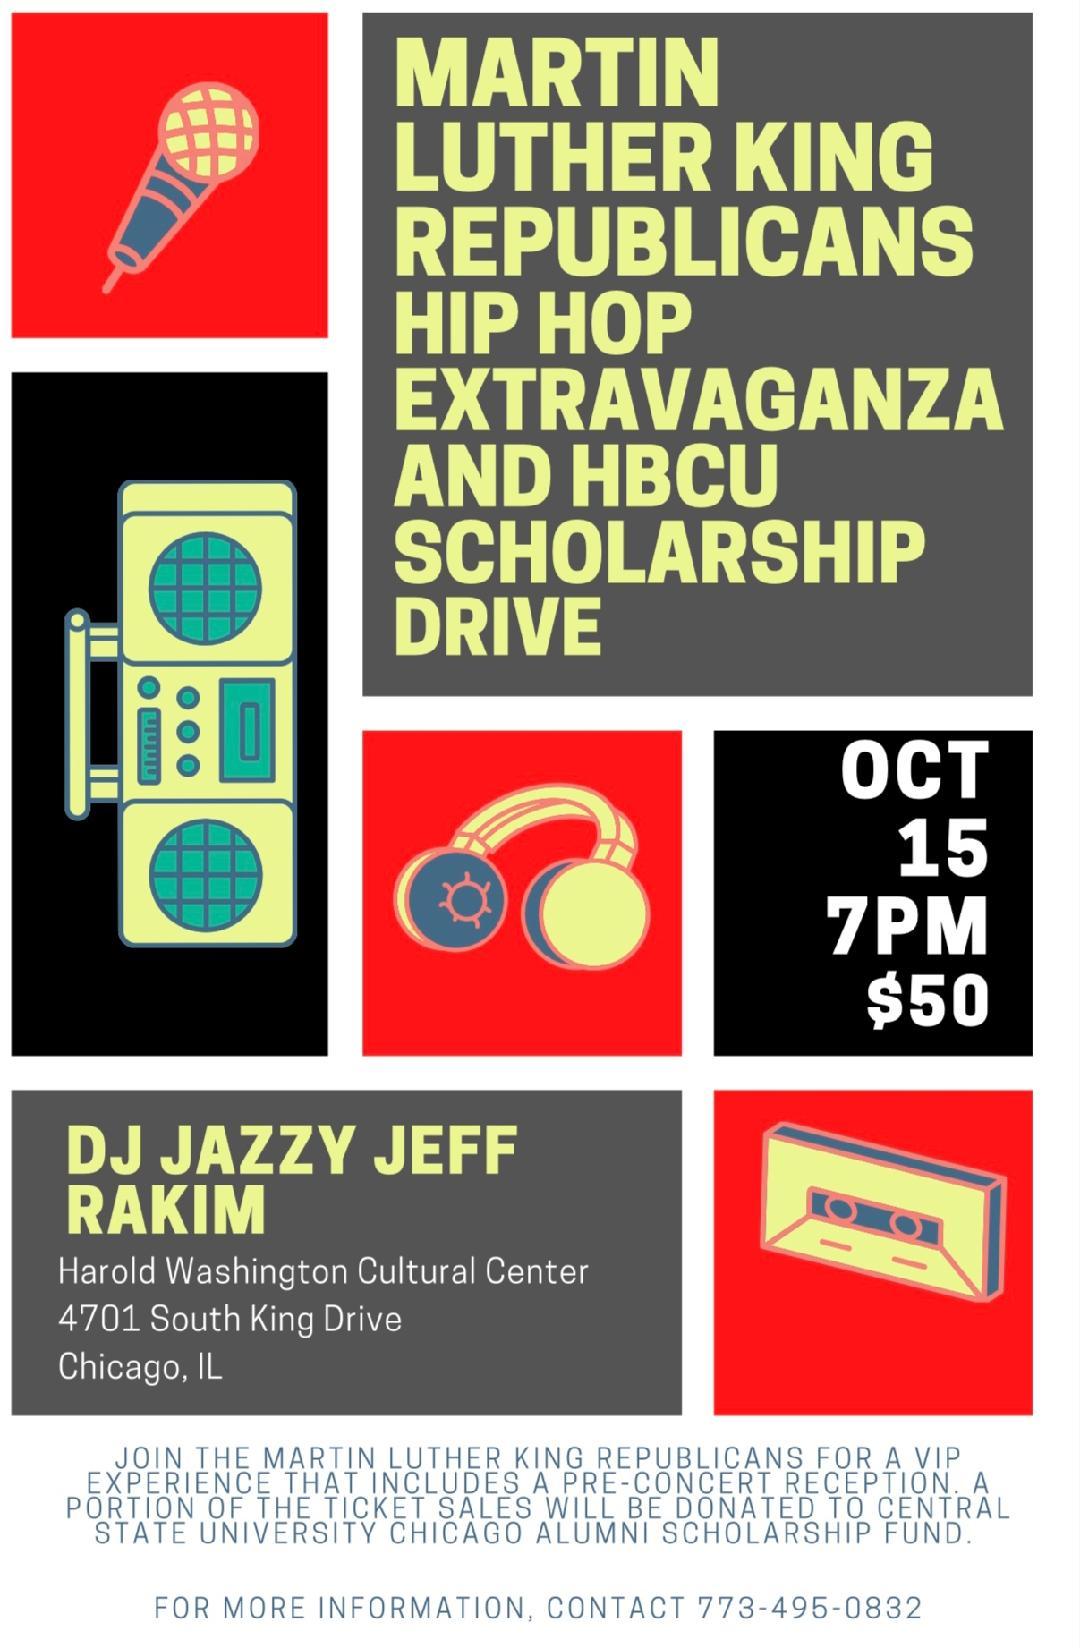 DJ Jazzy Jeff Rakim Event